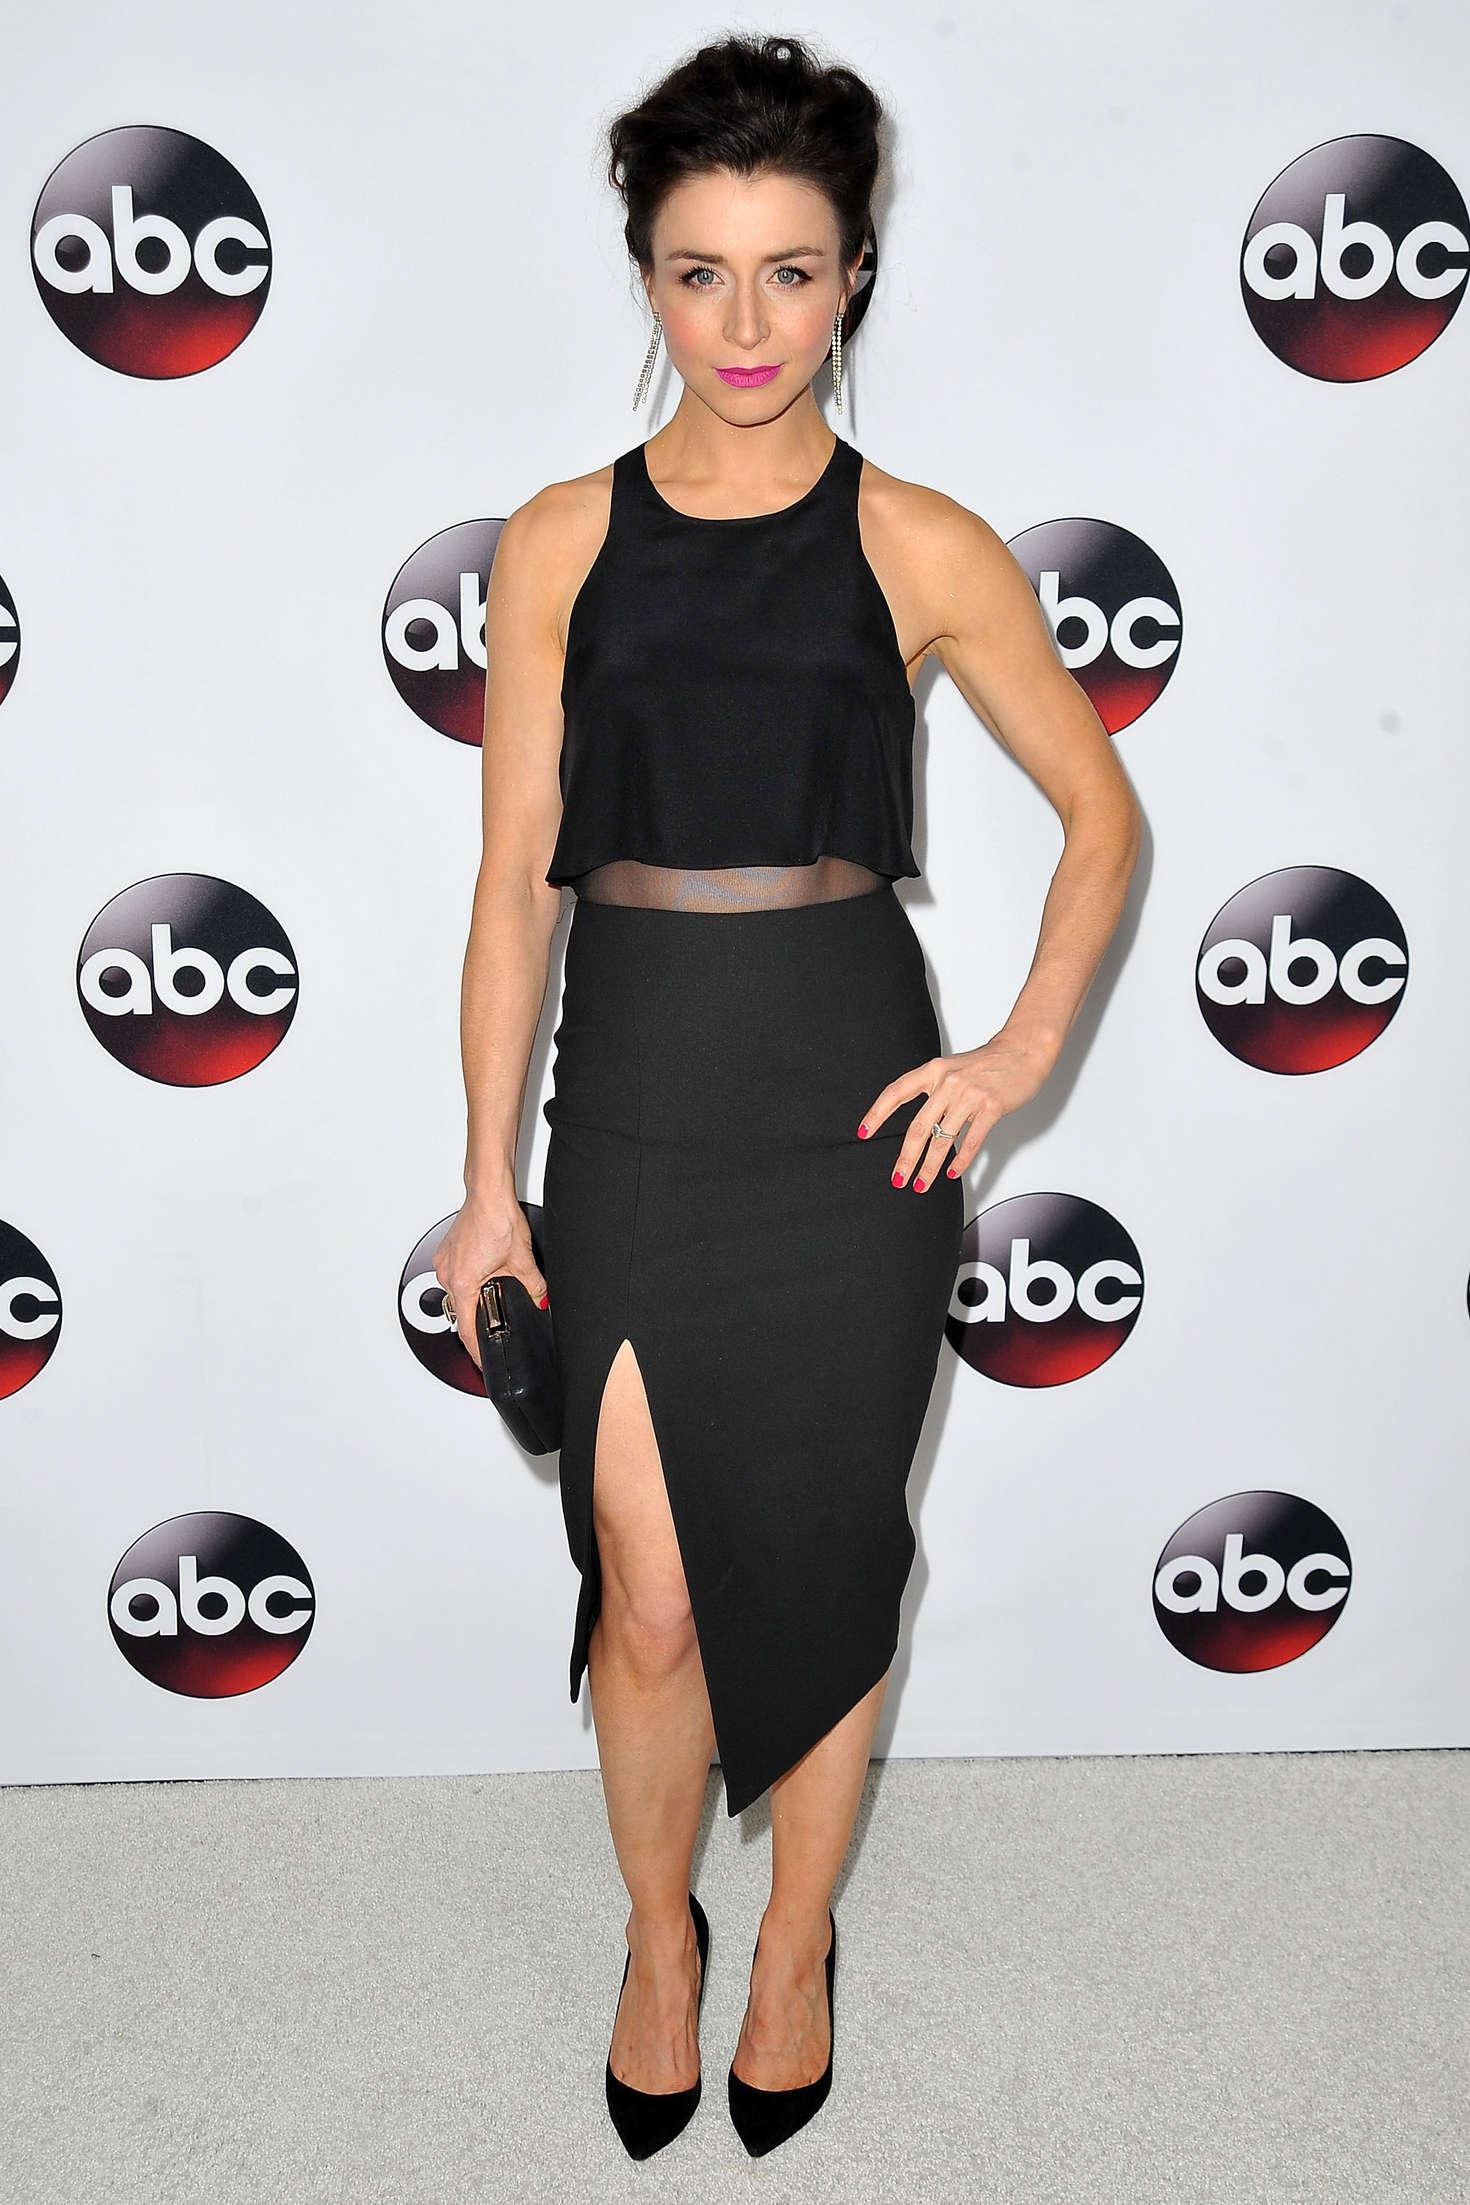 Caterina Scorsone Disney/ABC Winter TCA Press Tour in Pasadena